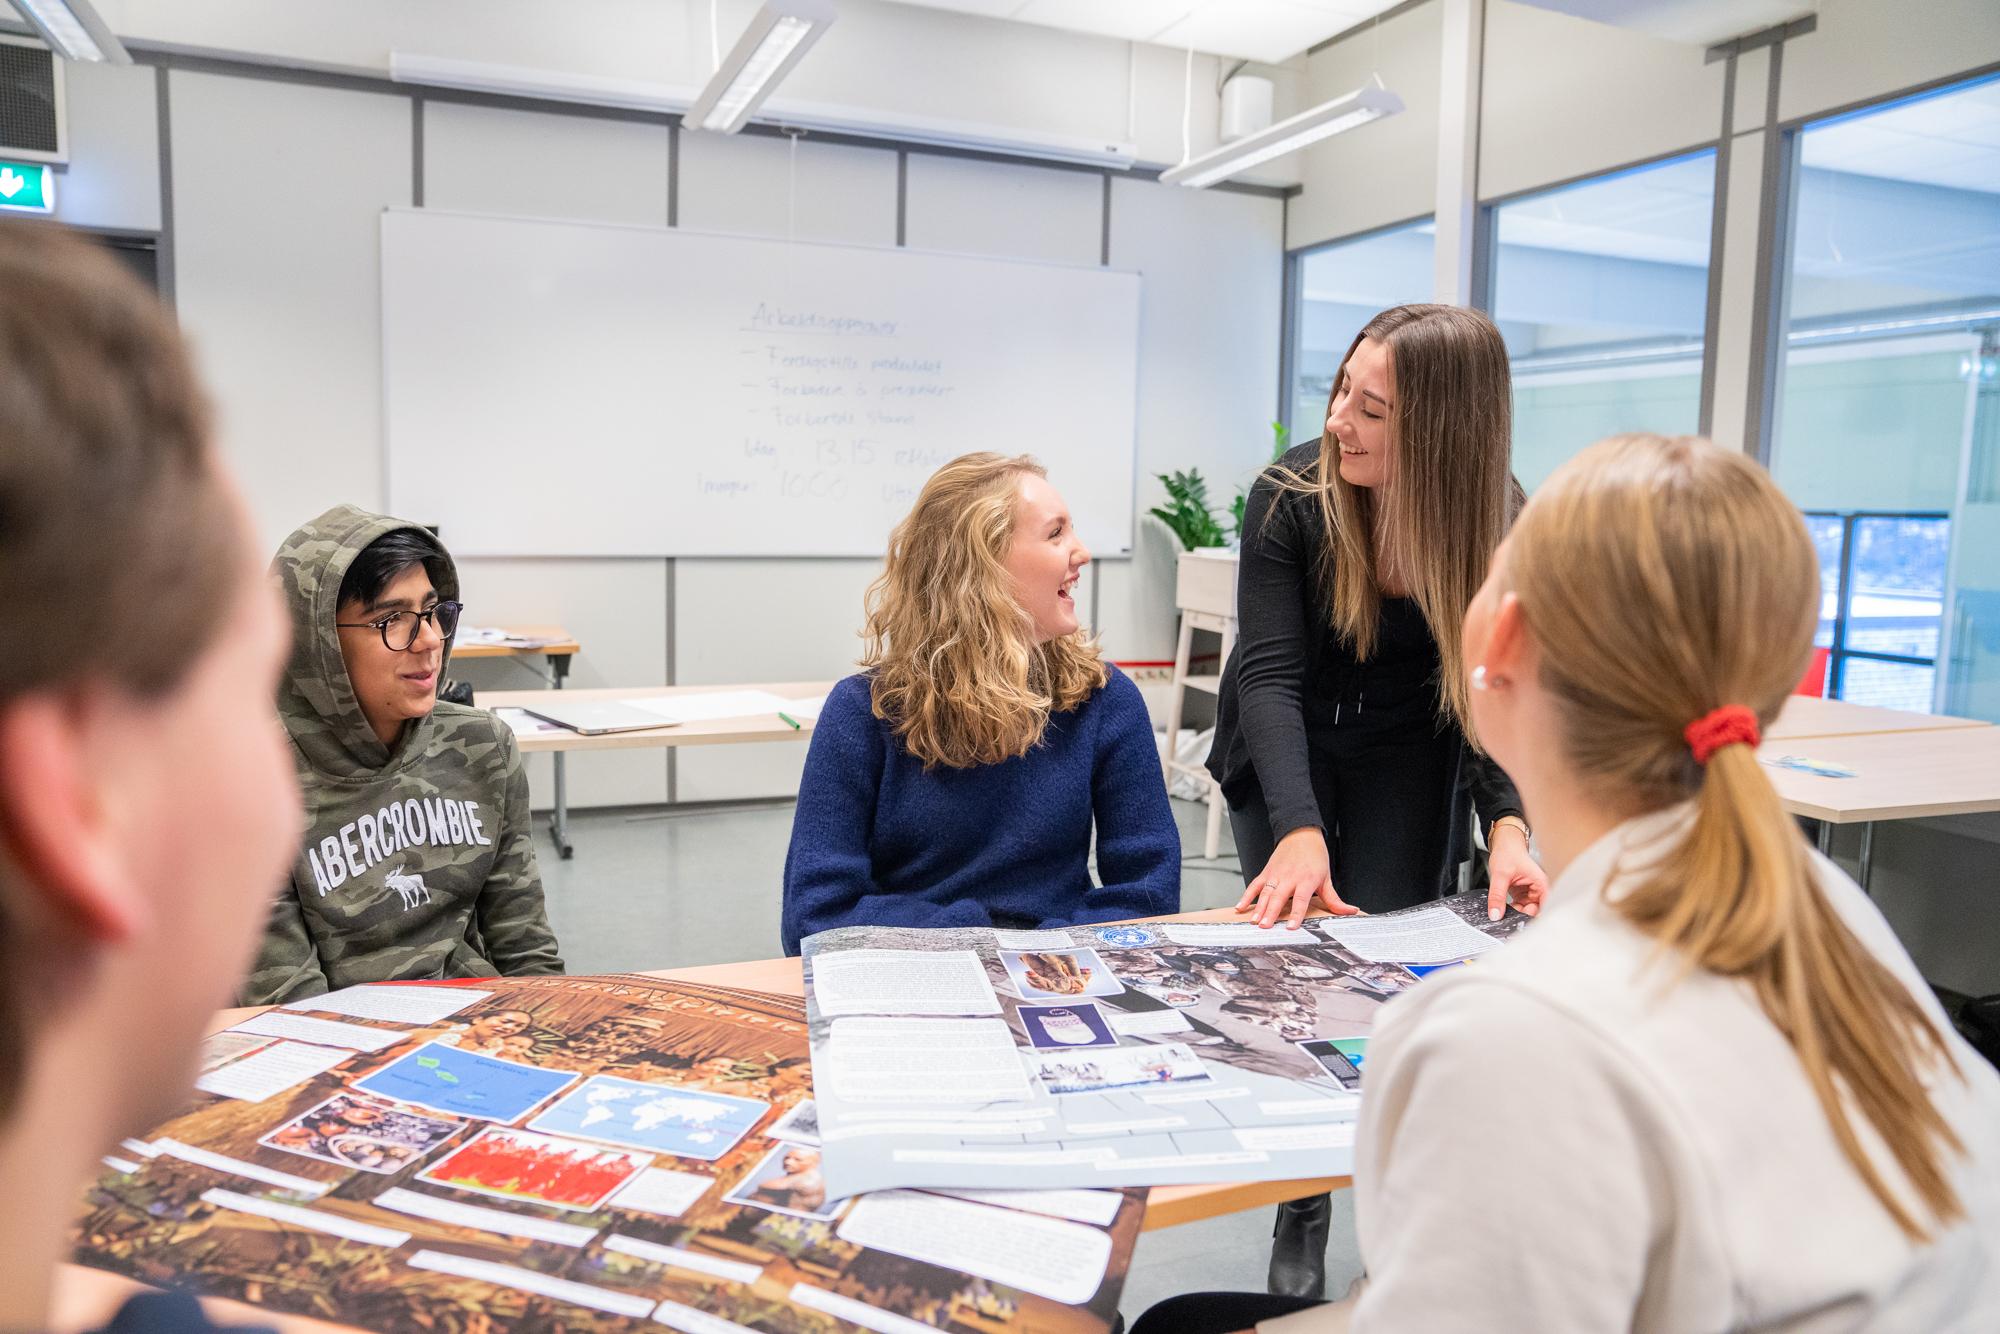 Fire elever arbeider rundt et bord men lærer forklarer. Foto.